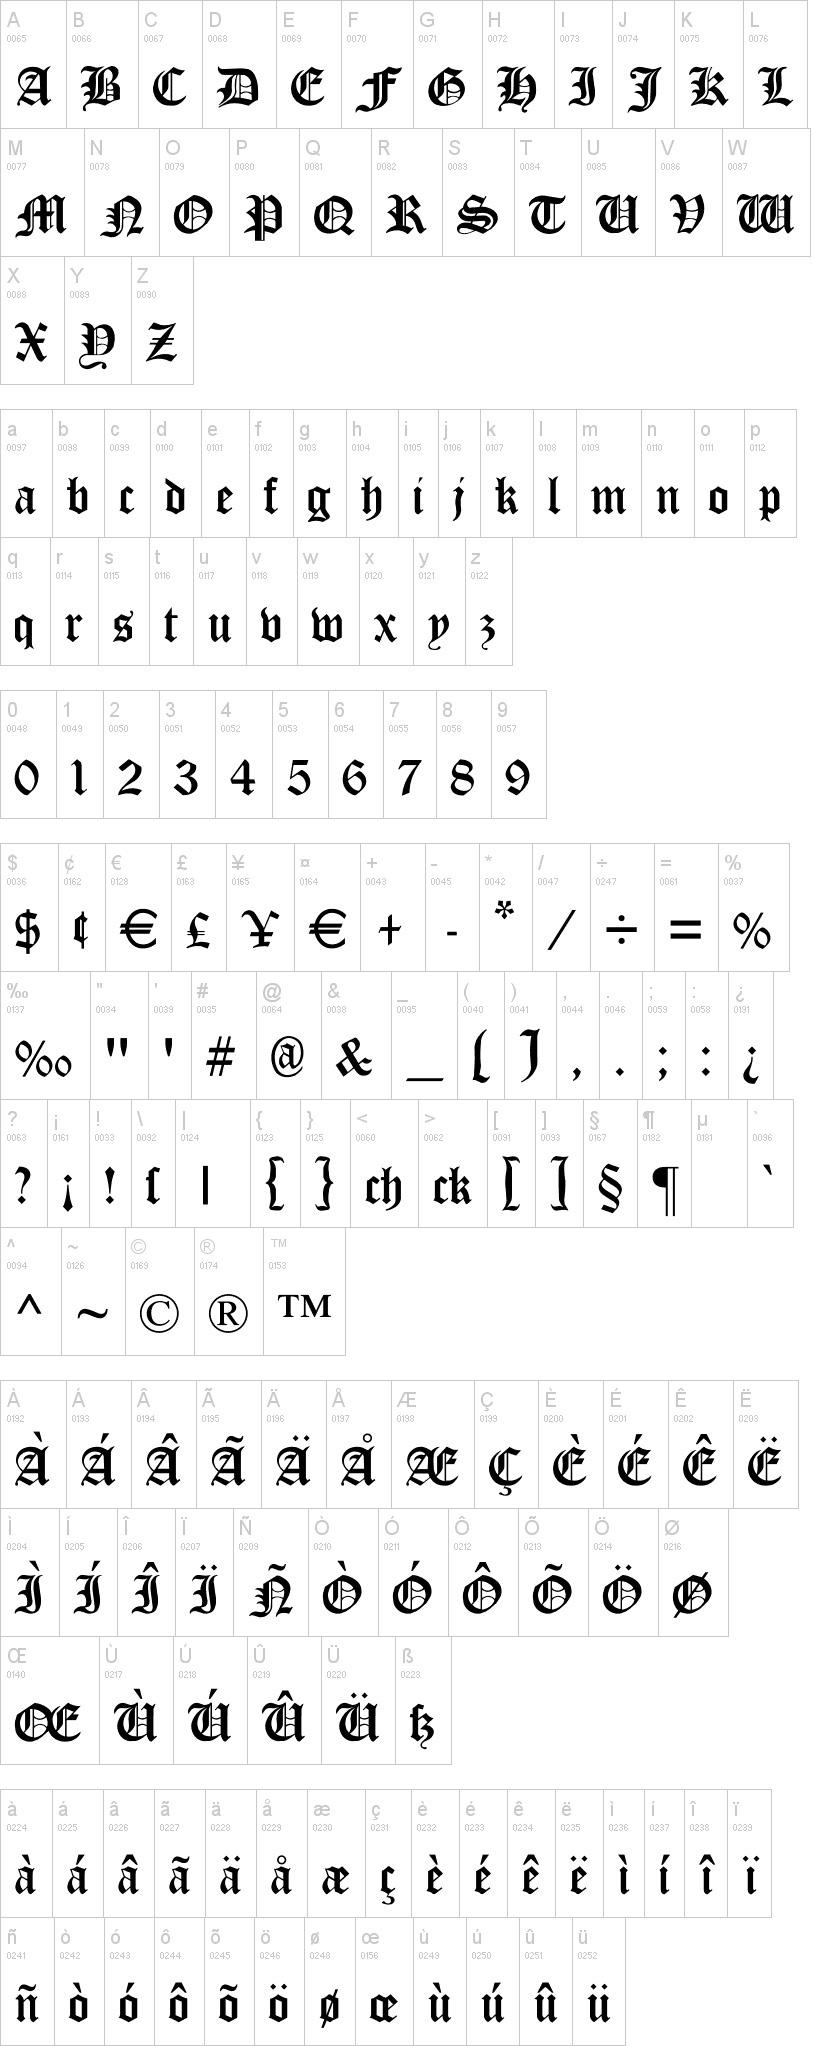 periodico voz galicia tipografia abecedario